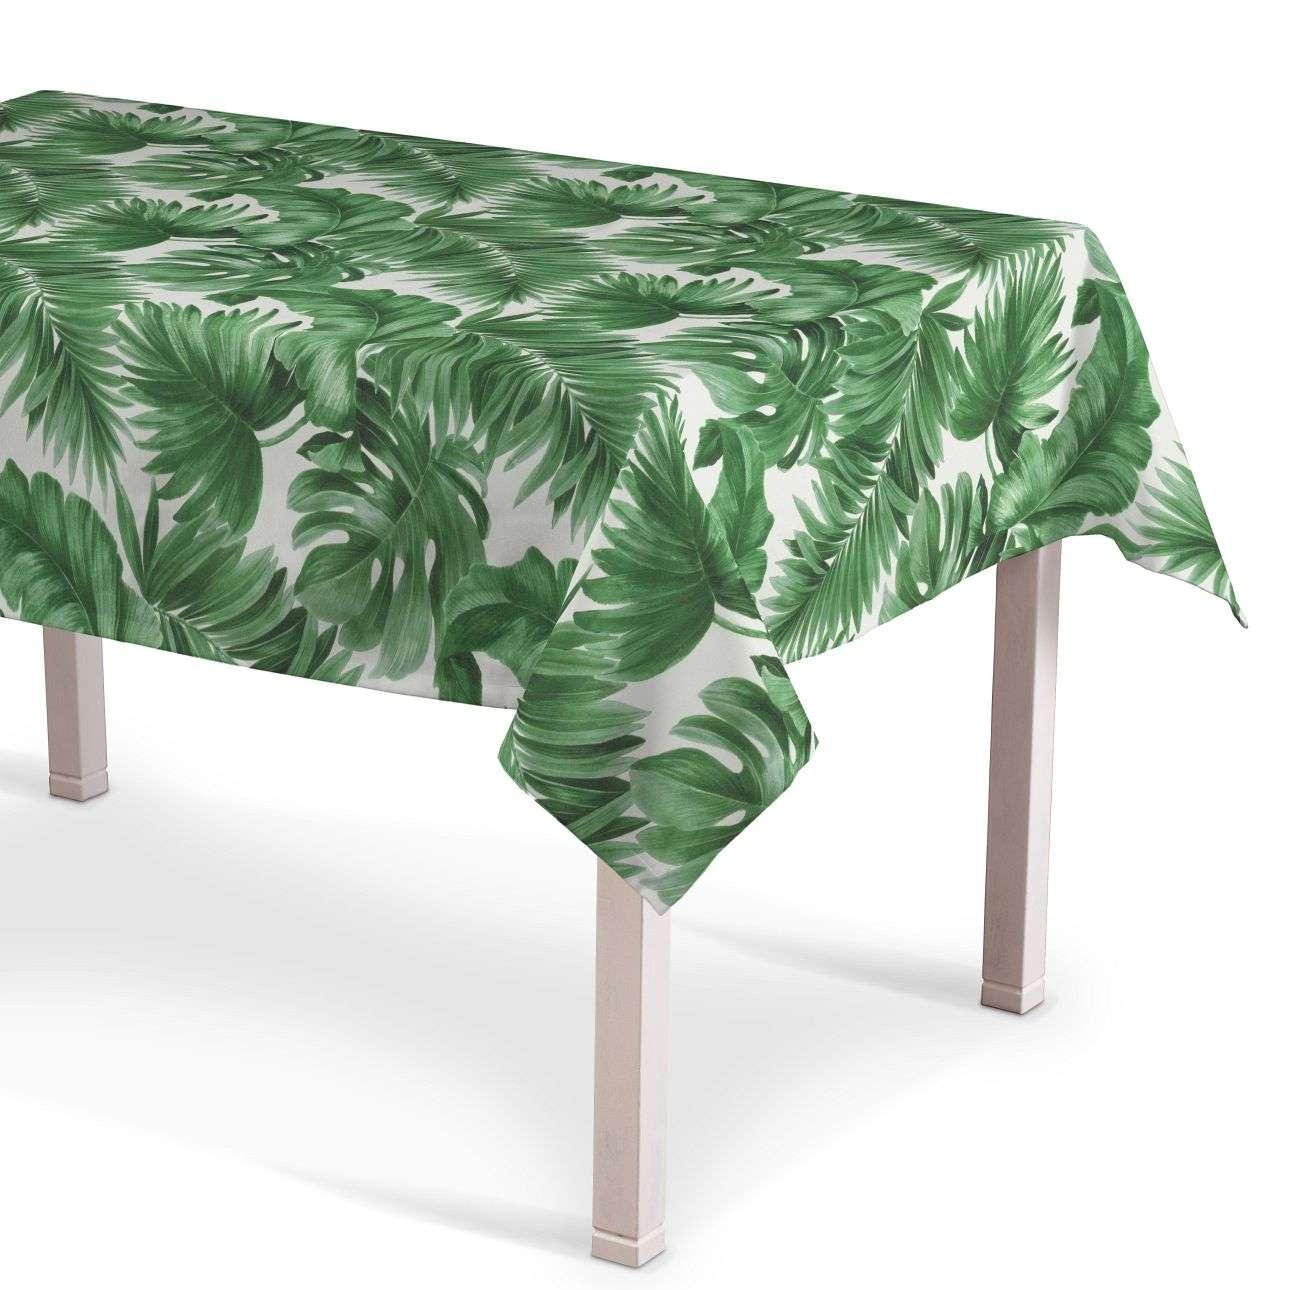 Rektangulære borddug fra kollektionen Tropical Island, Stof: 141-71